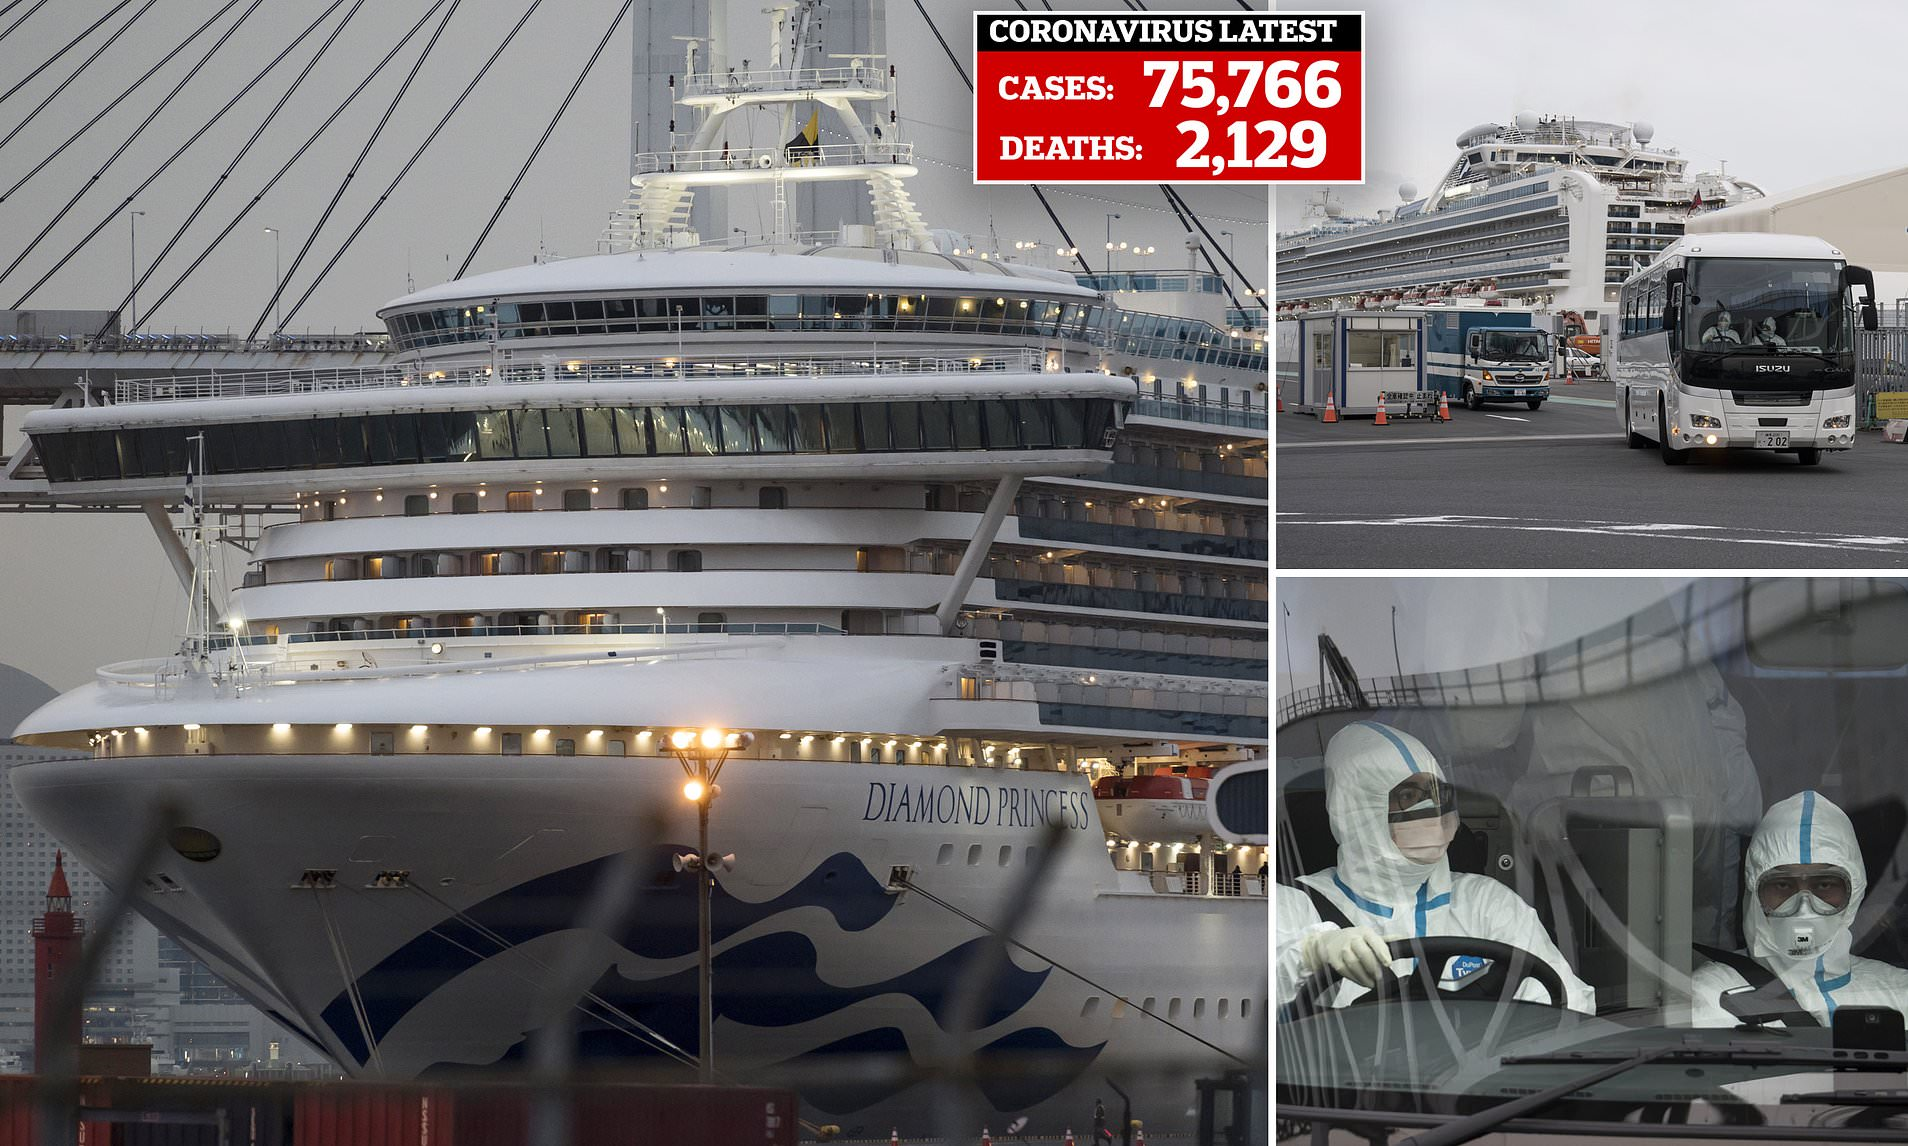 Coronavirus cruise ship Diamond Princess will be back in service ...